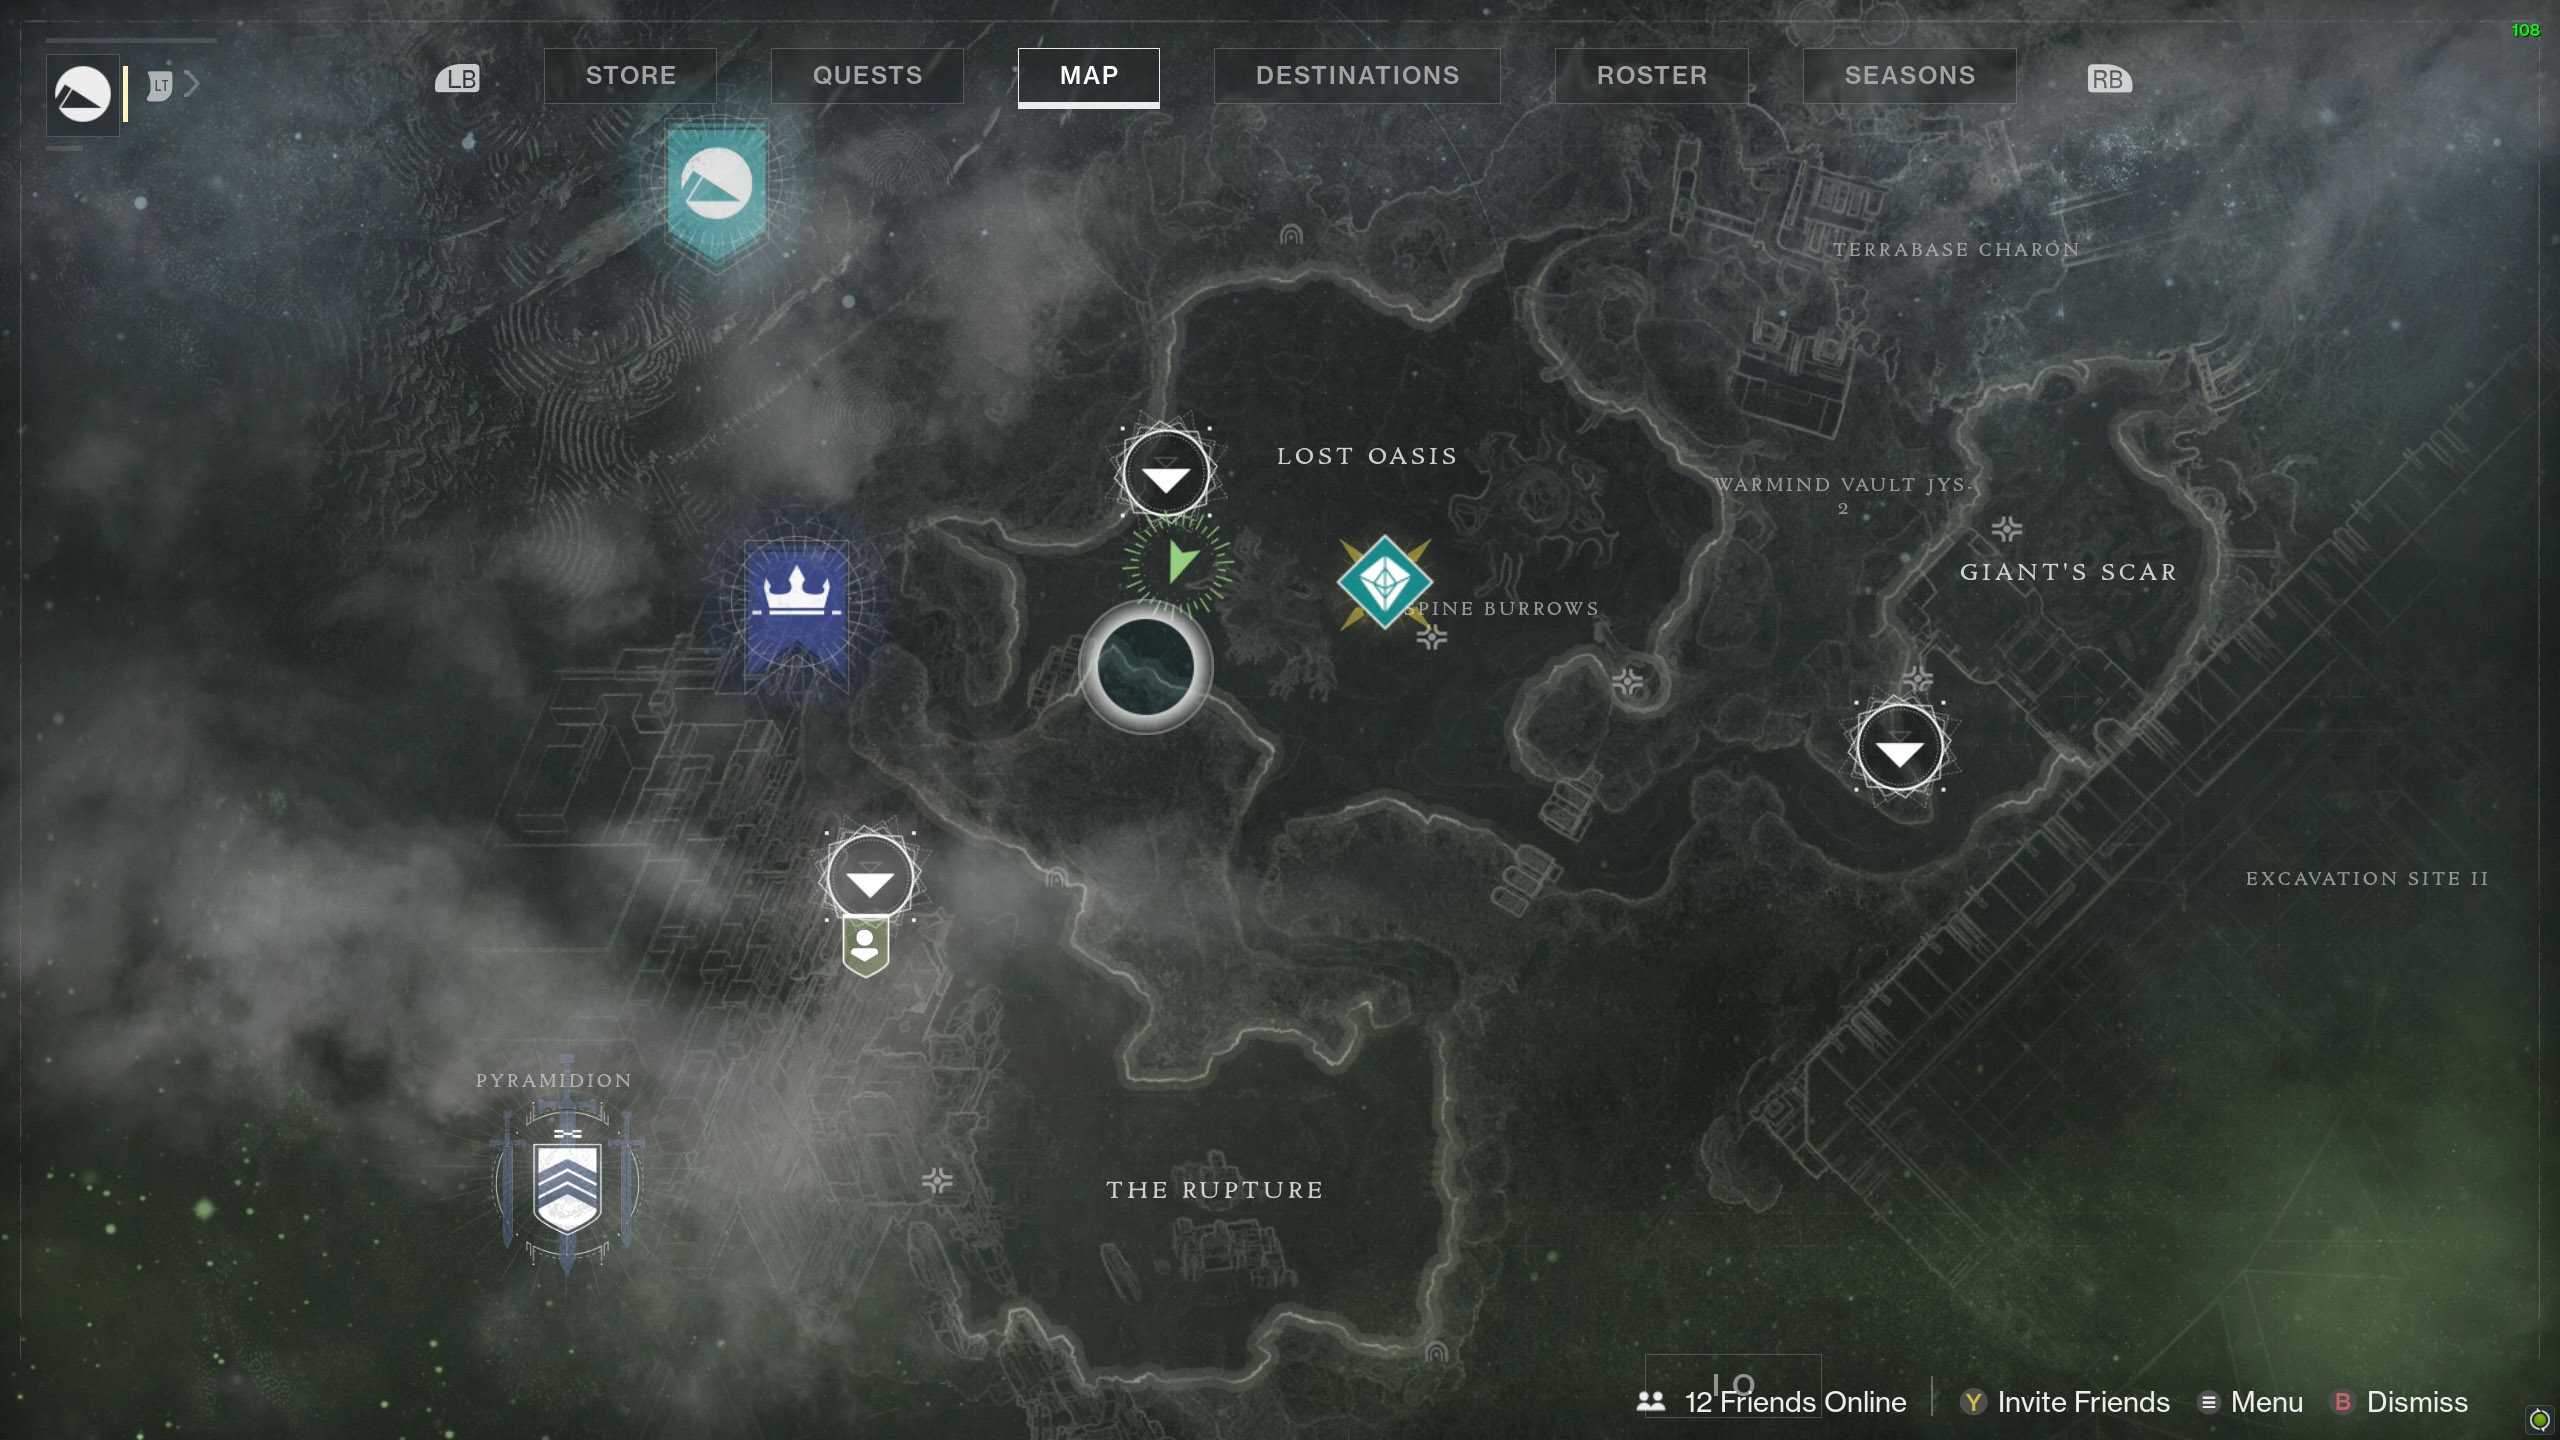 Destiny 2 Savanthuns Eyes Io Lost Oasis 1 map